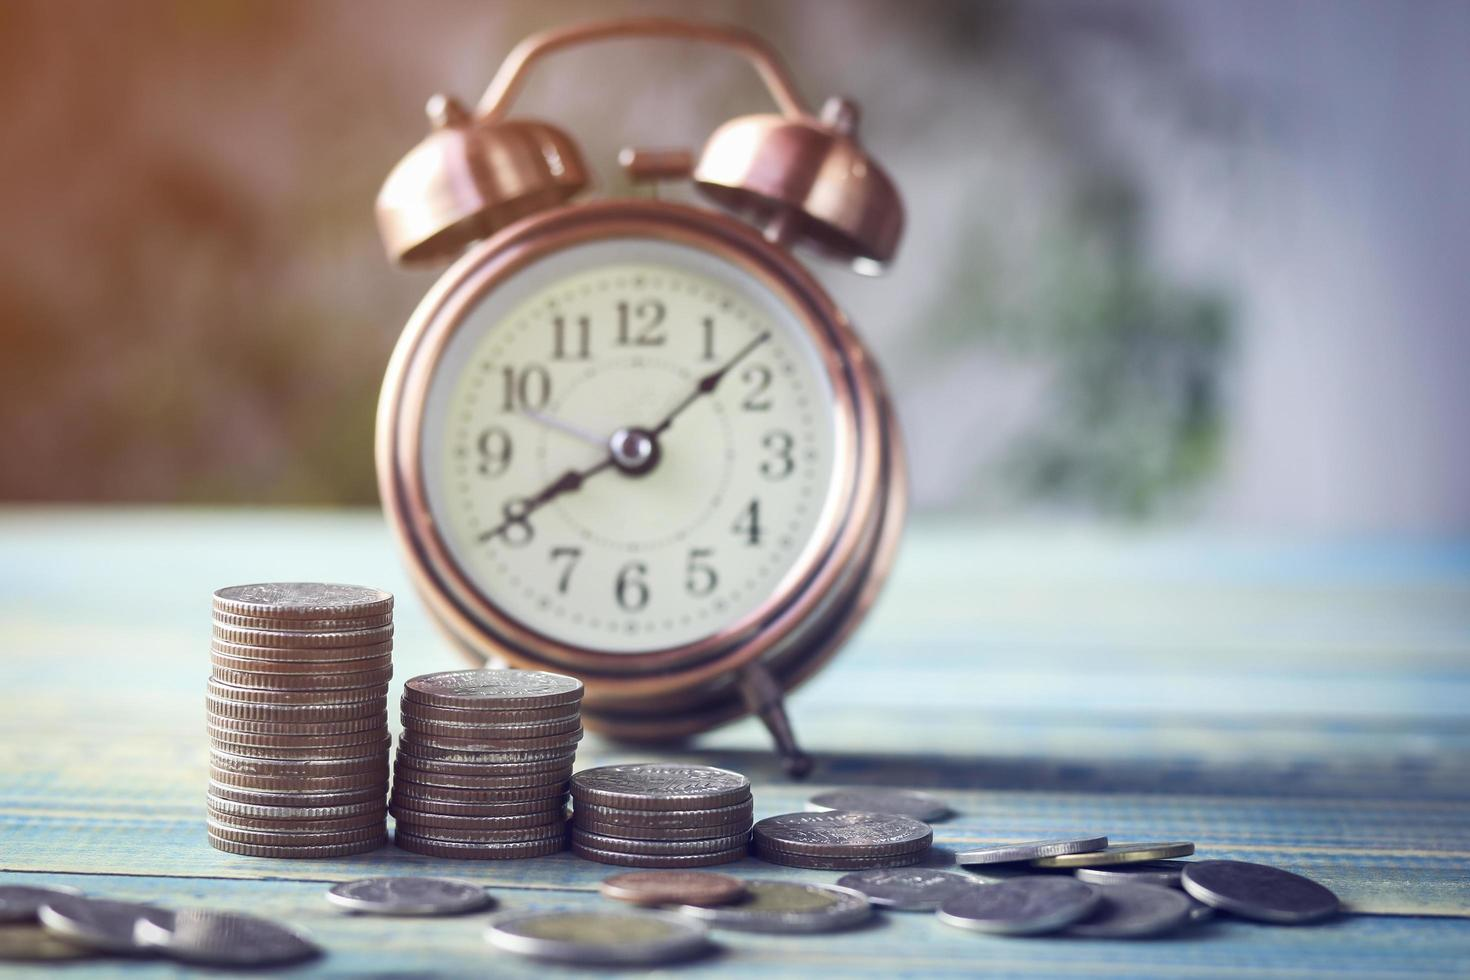 pila de monedas con reloj despertador rojo foto